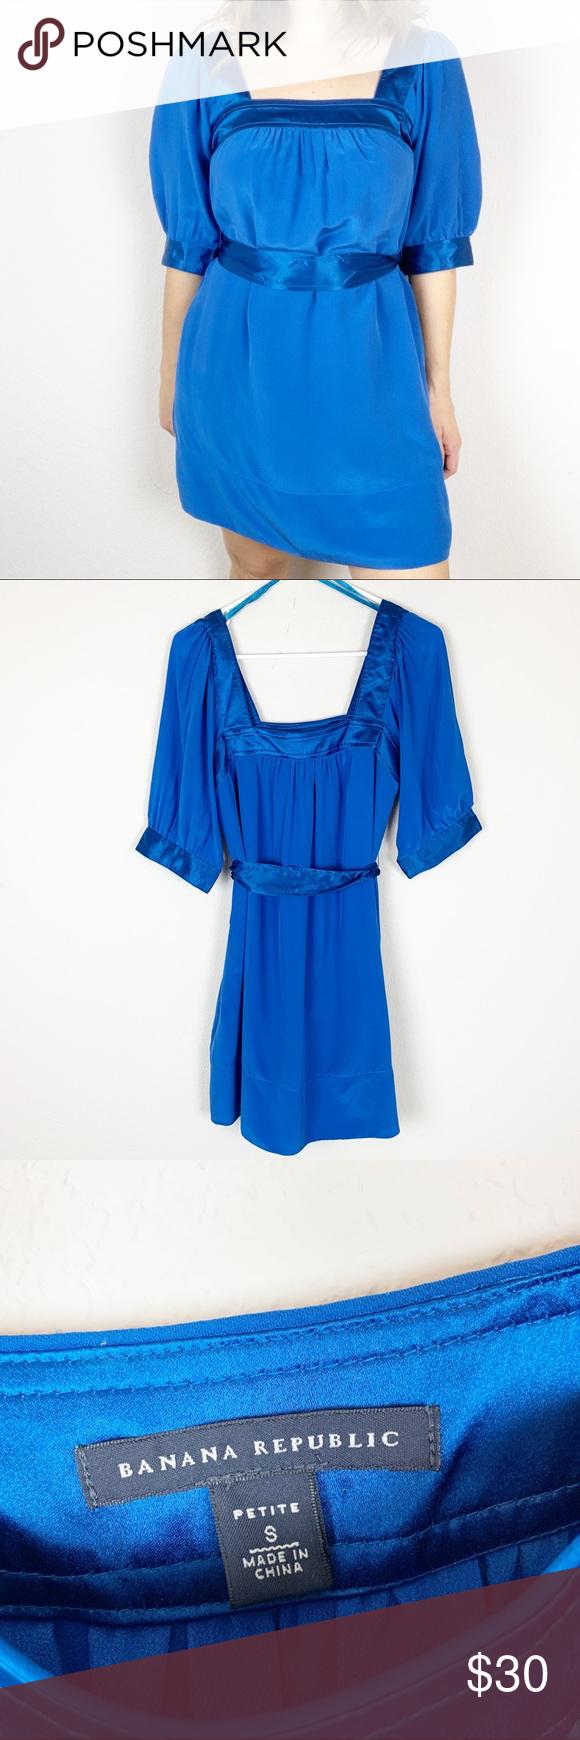 29++ Banana republic blue dress ideas